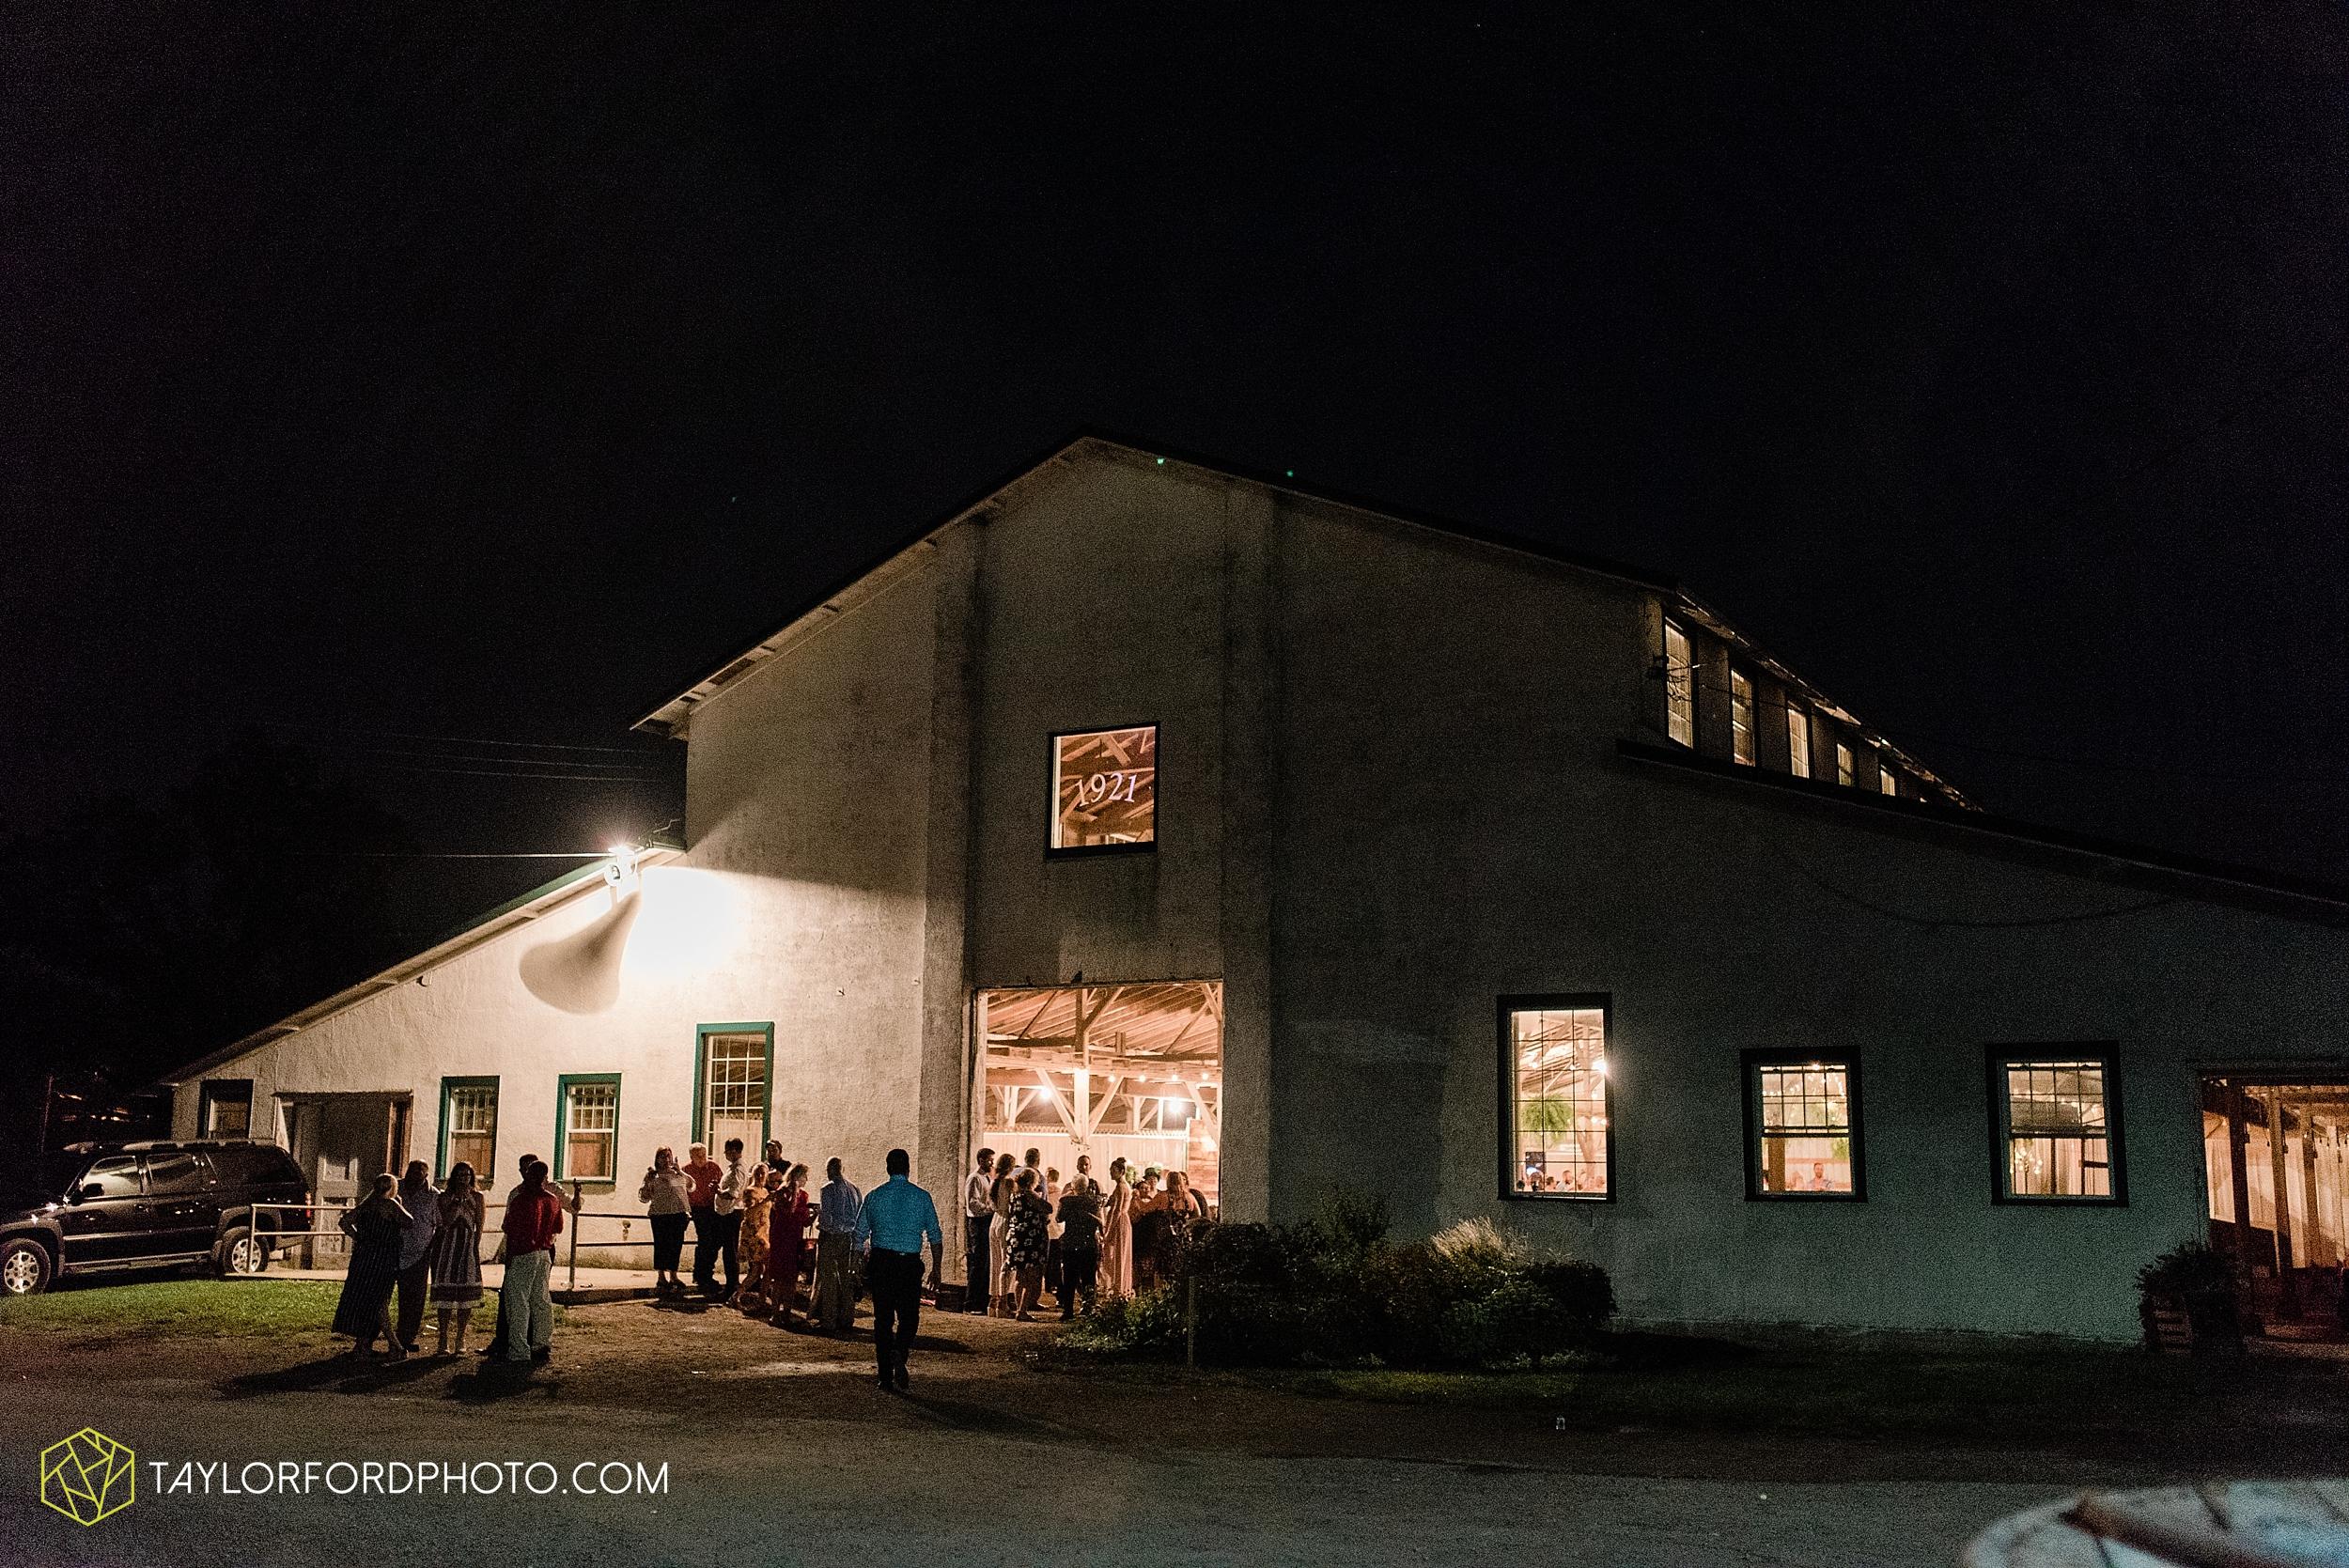 van-wert-ohio-first-united-methodist-church-county-dairy-barn-wedding-photographer-taylor-ford-photography_9893.jpg